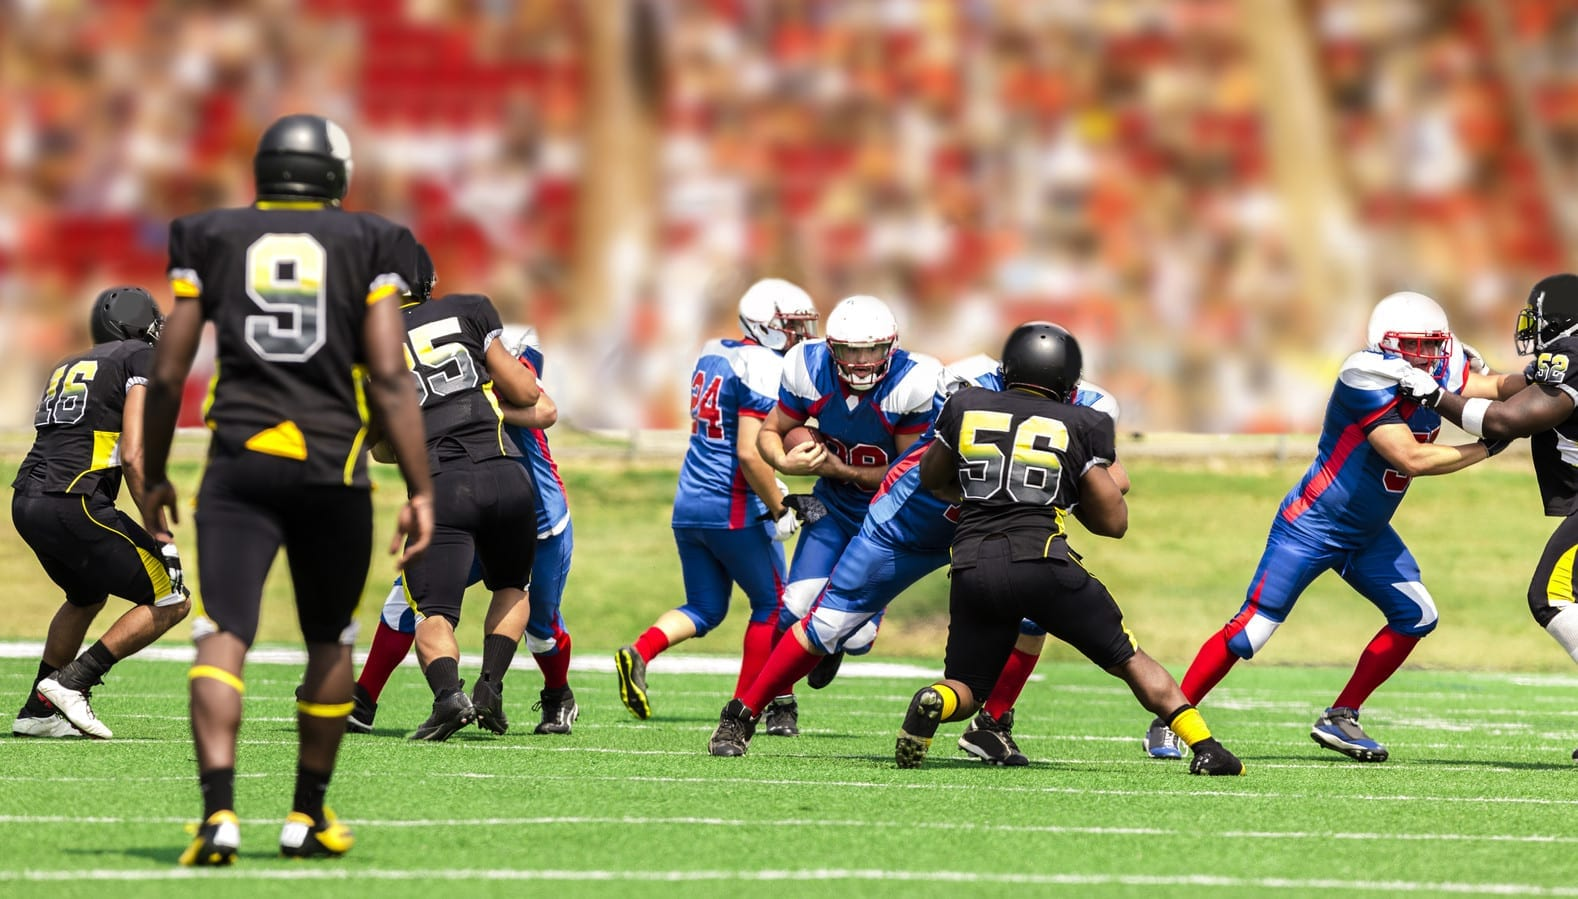 High School Football Game Stock Photo